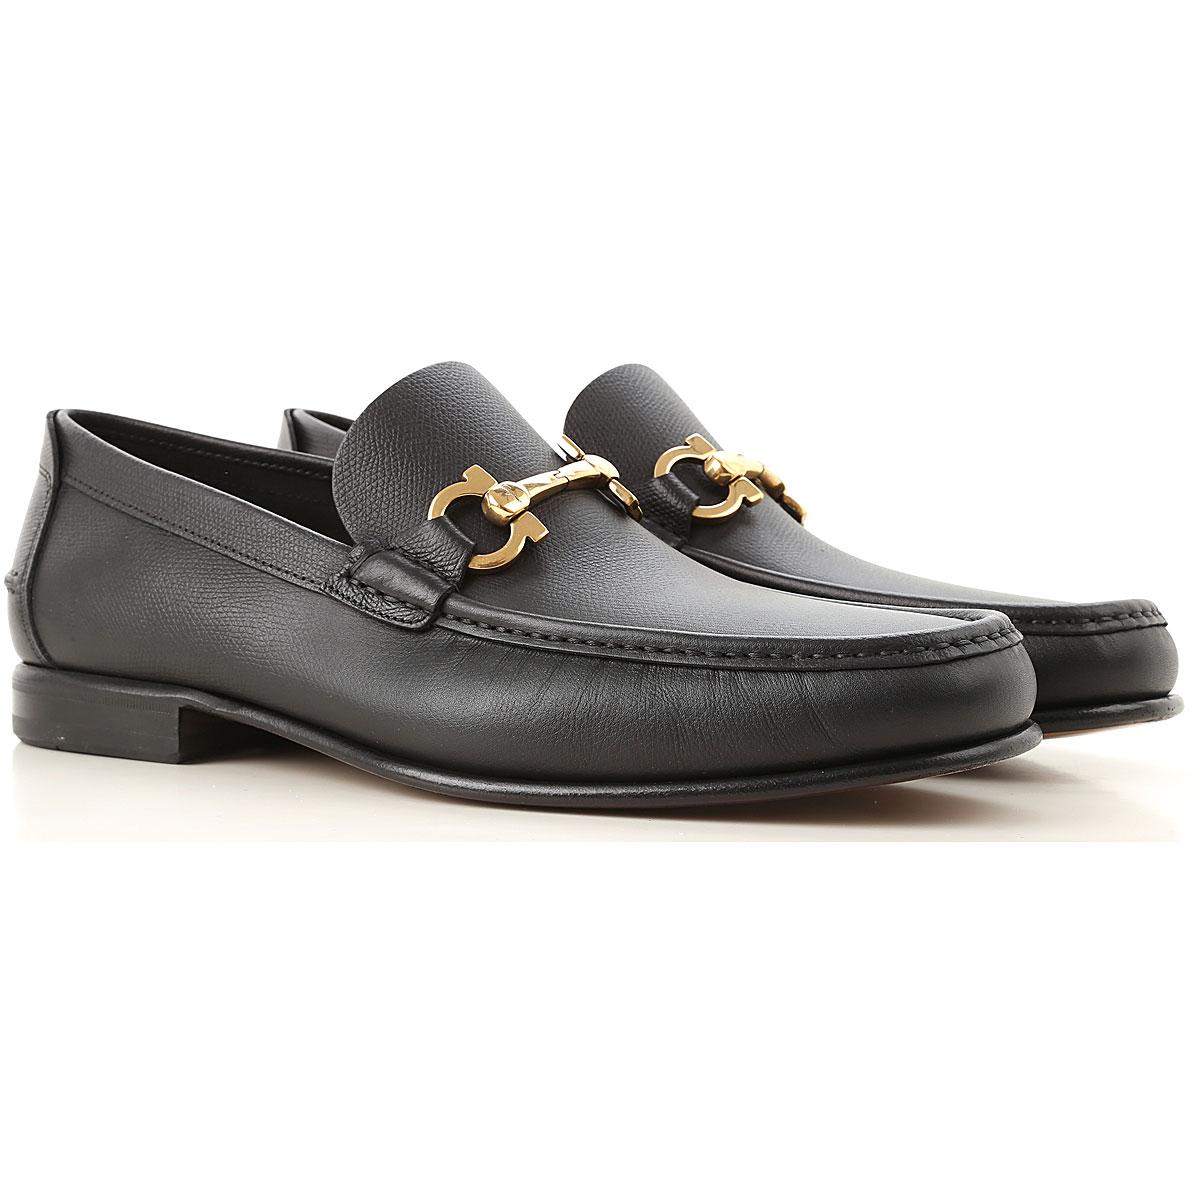 Salvatore Ferragamo Loafers for Men On Sale, Black, Leather, 2019, 7 9.5